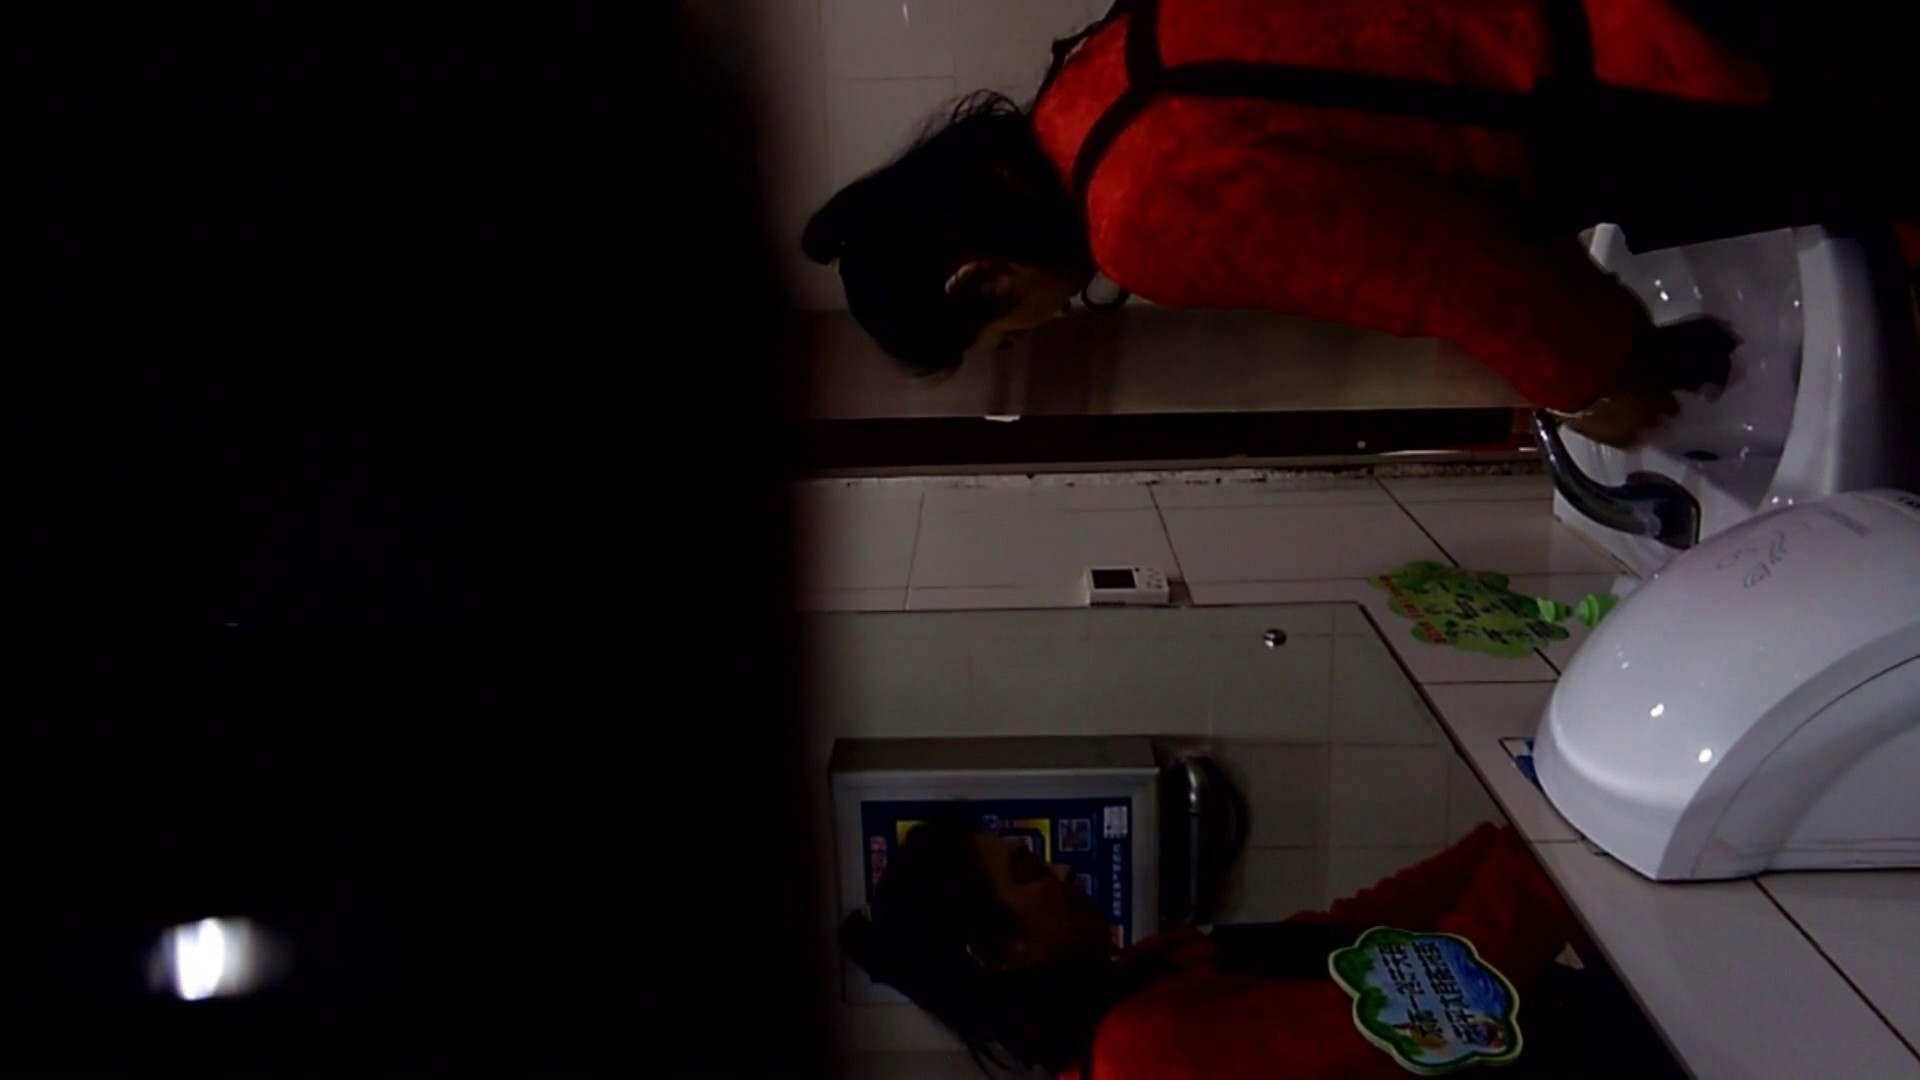 芸術大学ガチ潜入盗撮 JD盗撮 美女の洗面所の秘密 Vol.105 美肌 ワレメ無修正動画無料 83枚 77